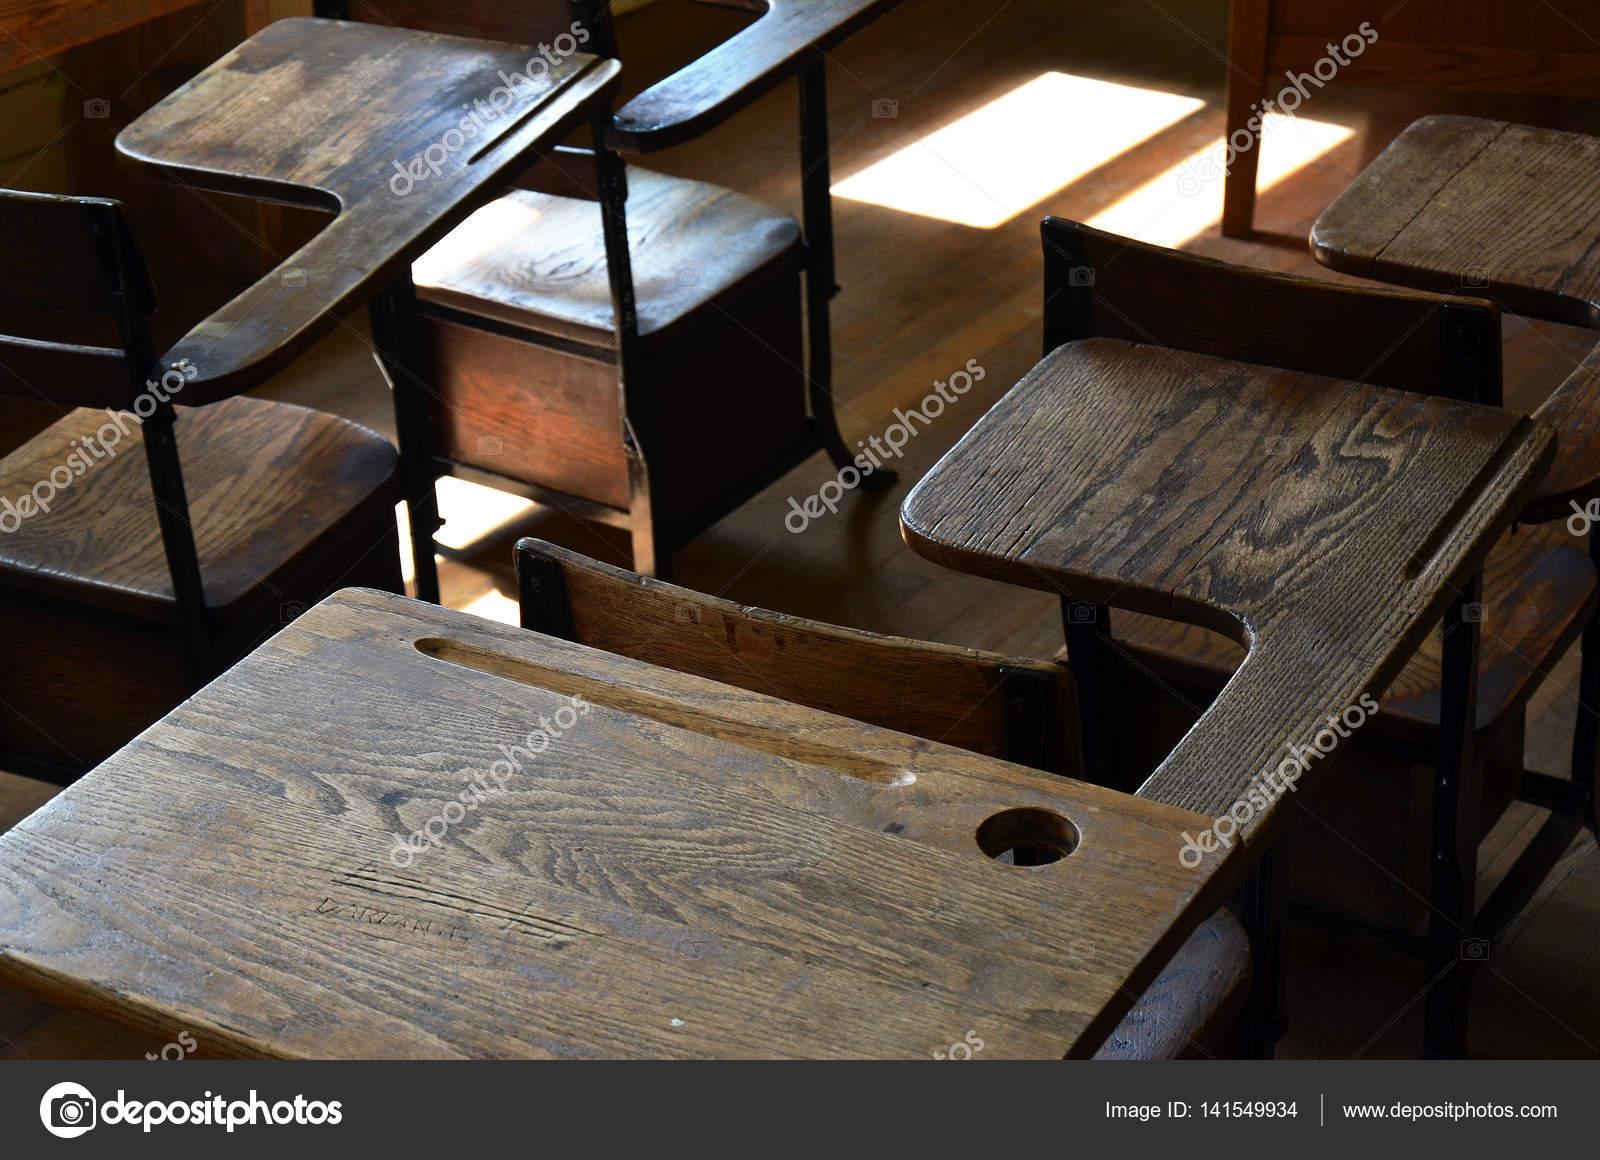 Old Wooden School Desks — Stock Photo © shutterbug68 #141549934